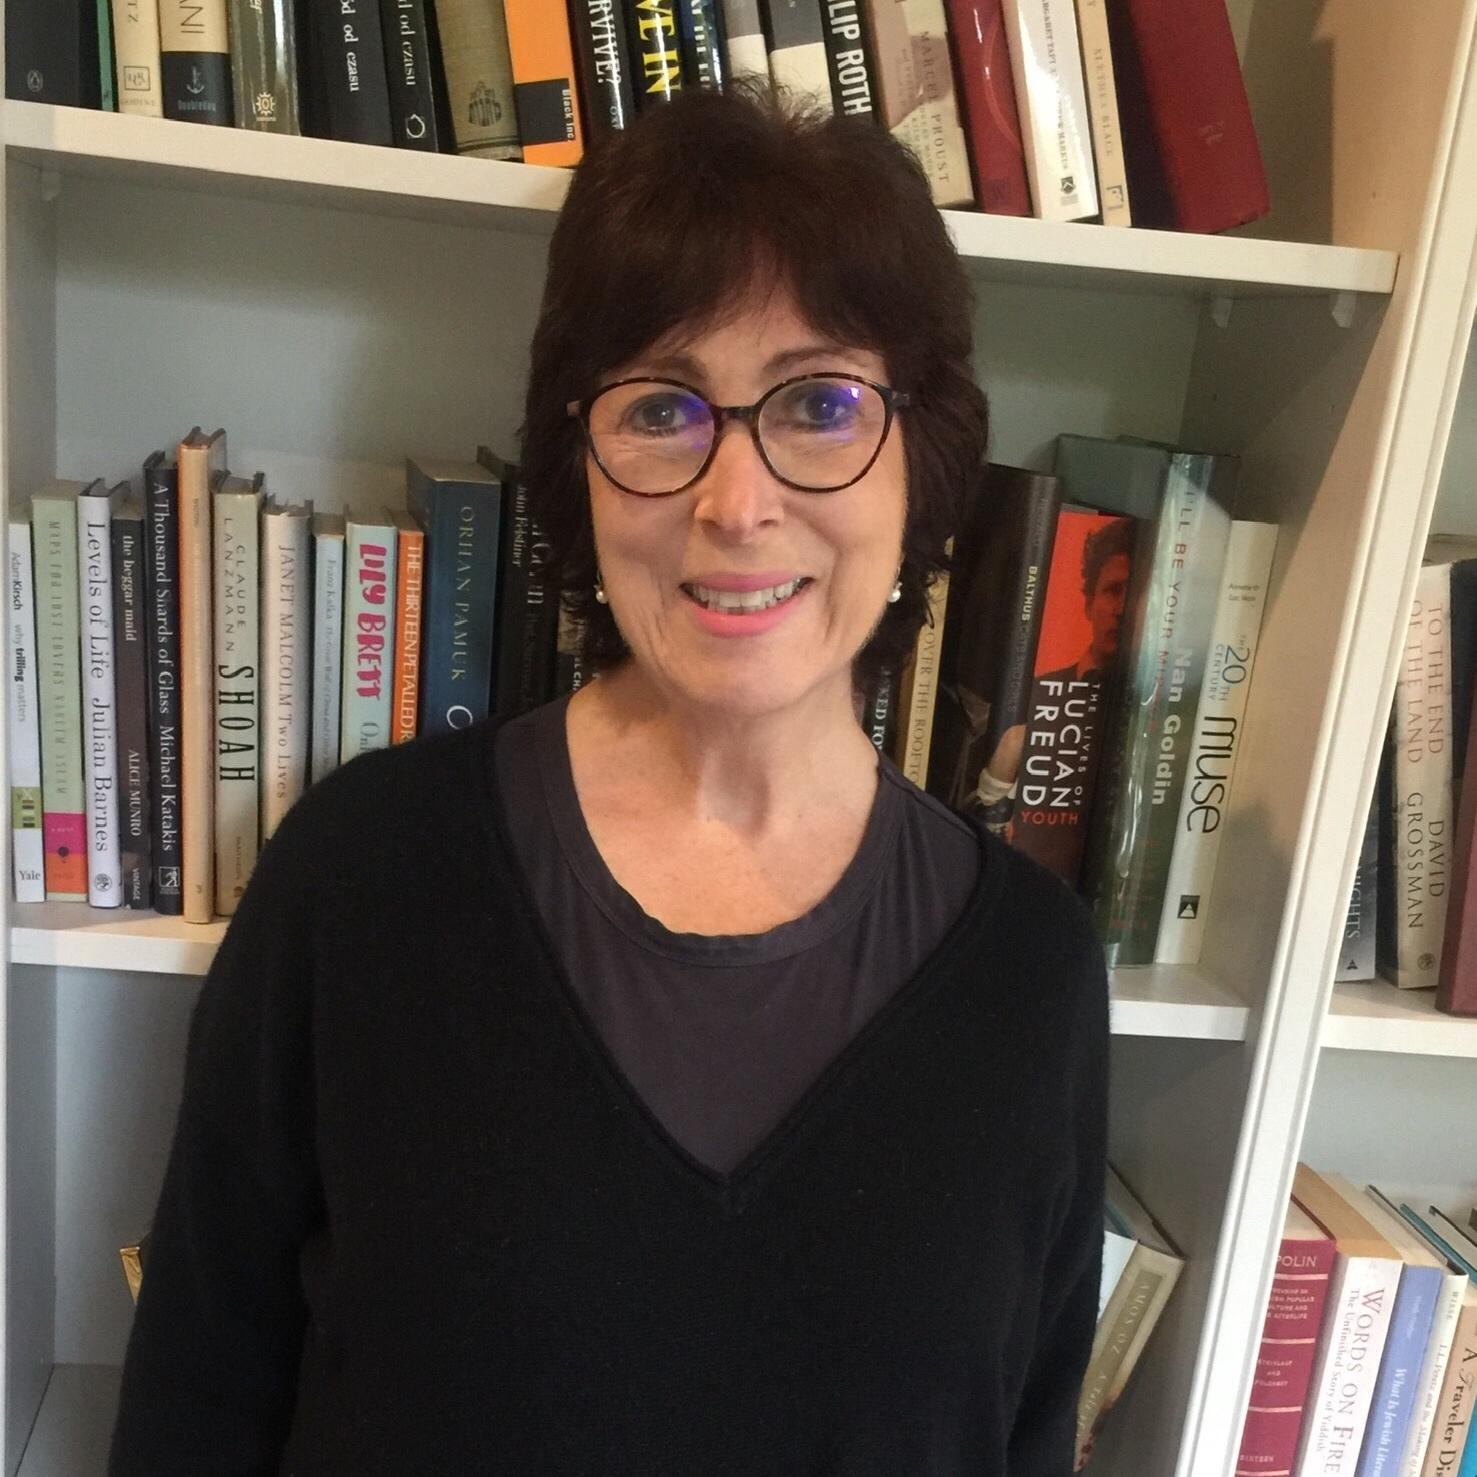 Marcia Jacobs